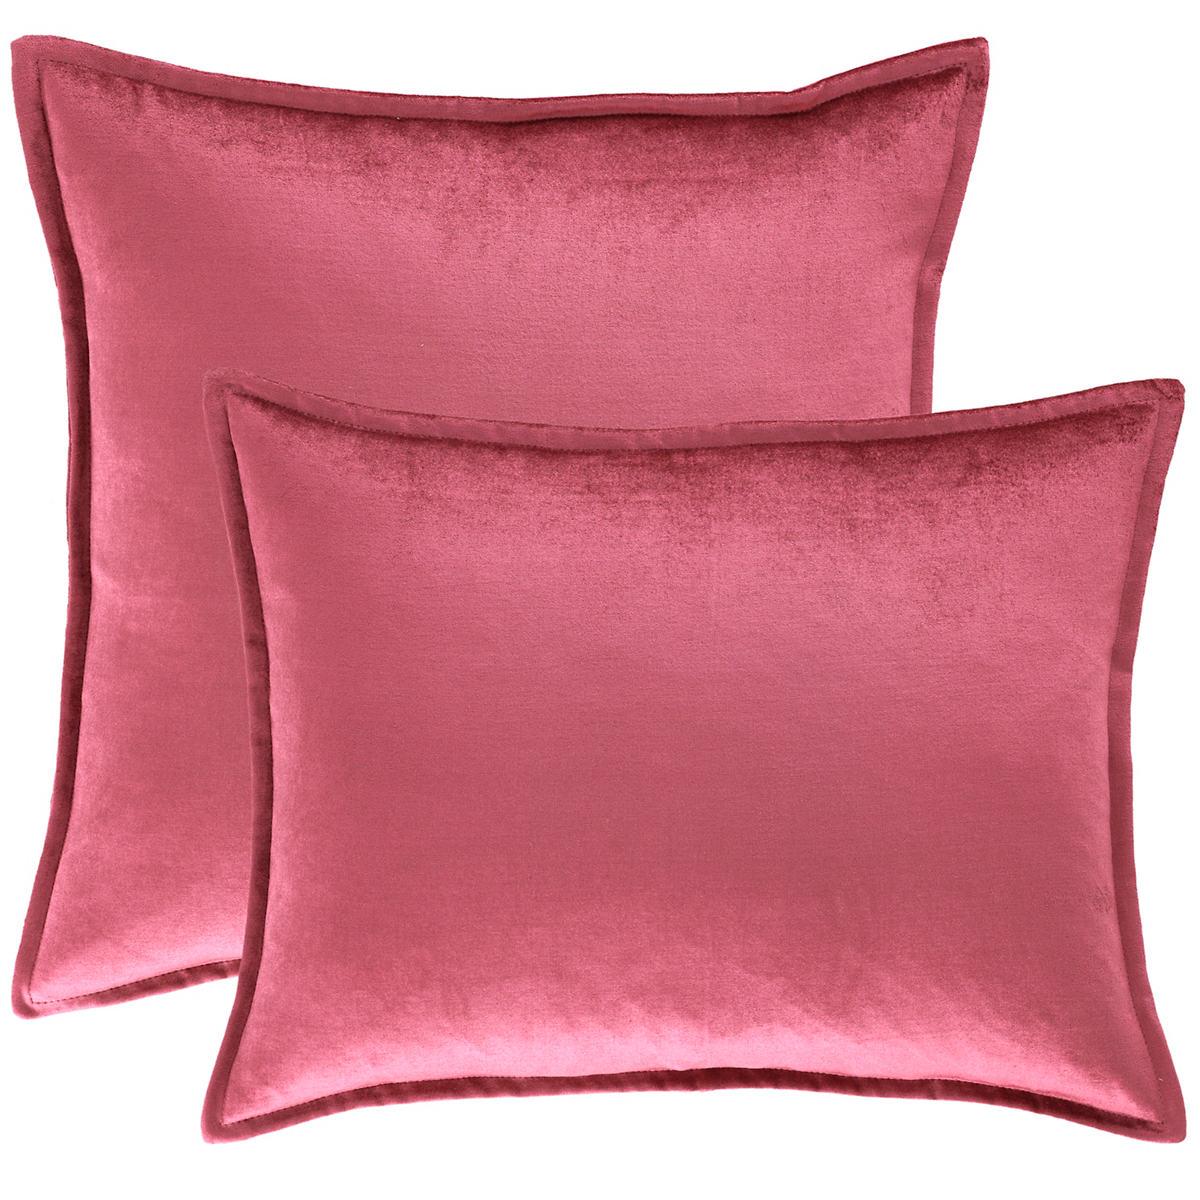 Panne Velvet Berry Decorative Pillow